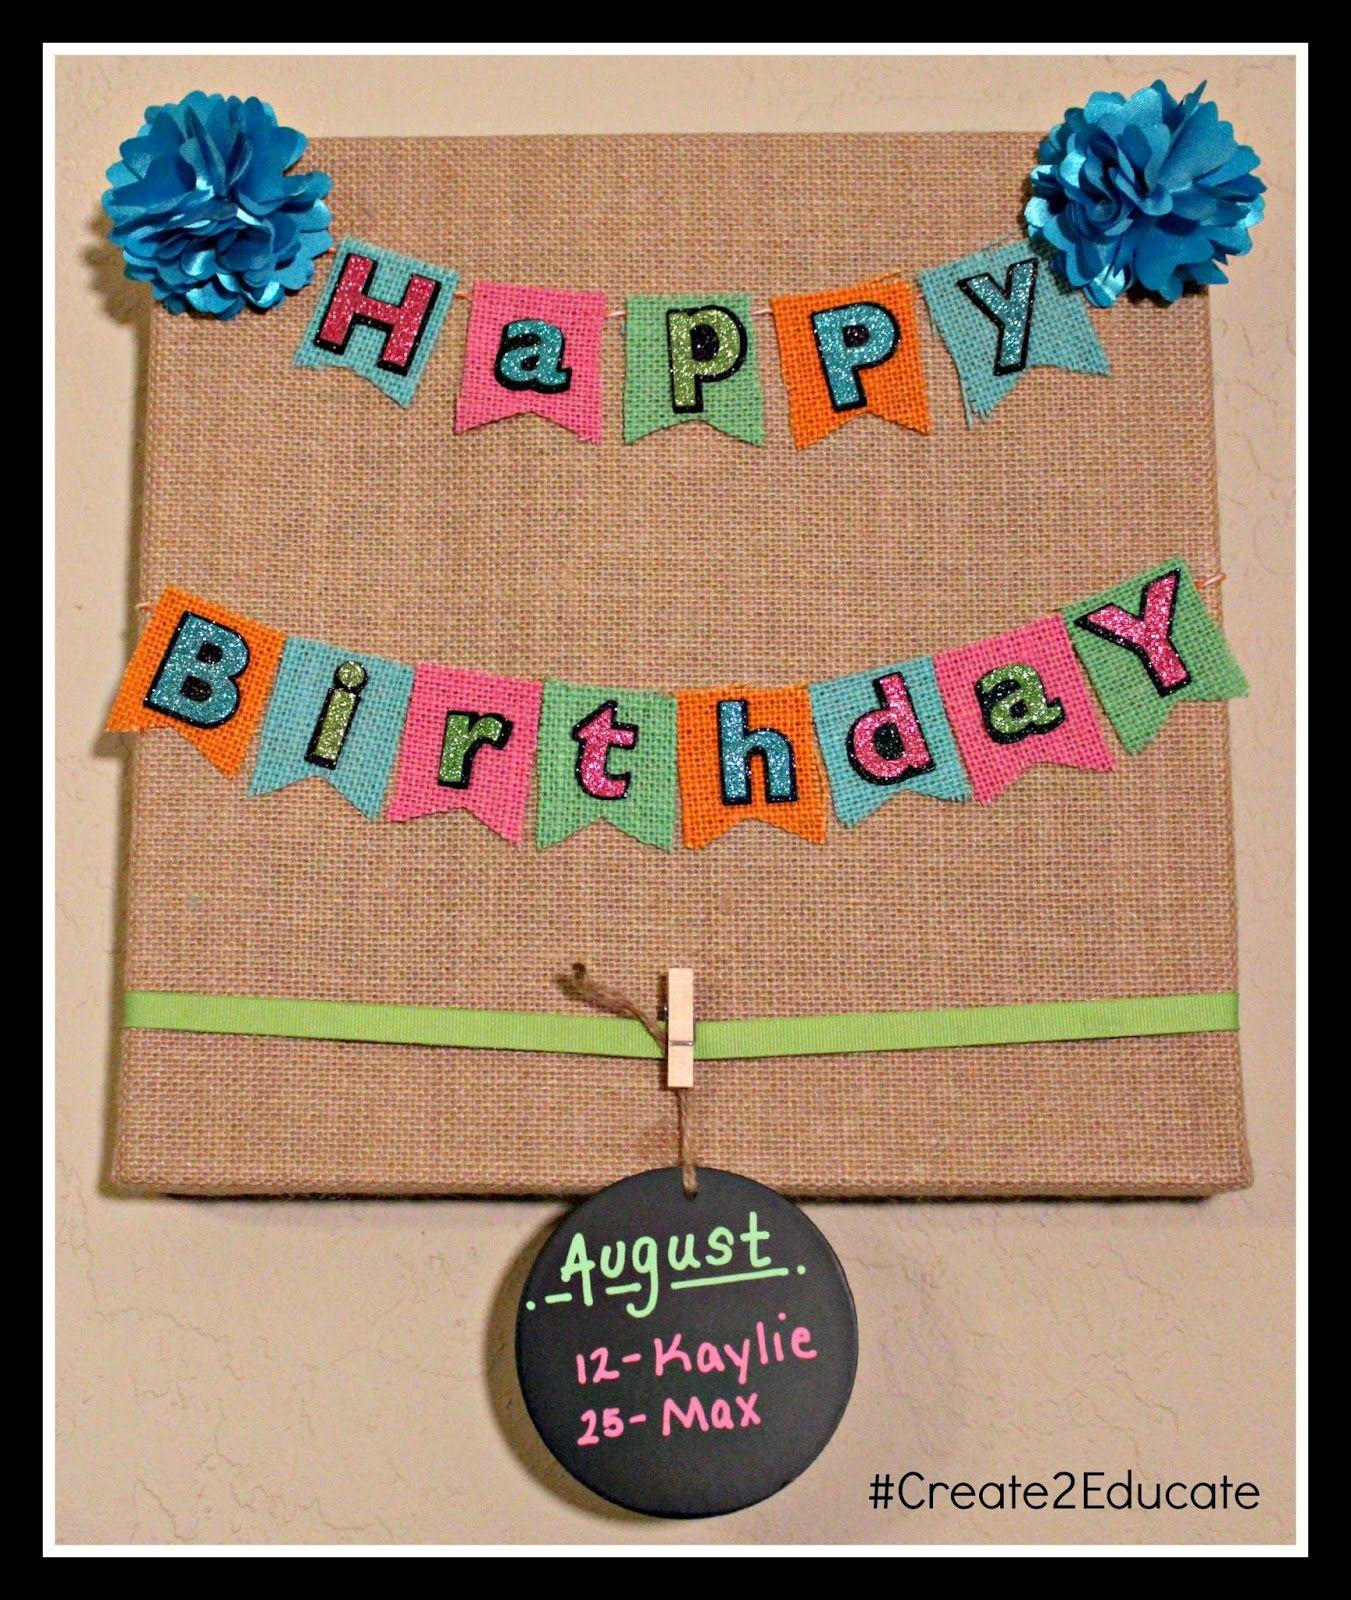 Birthday Board Display - for teachers lounge, change teachers each month.